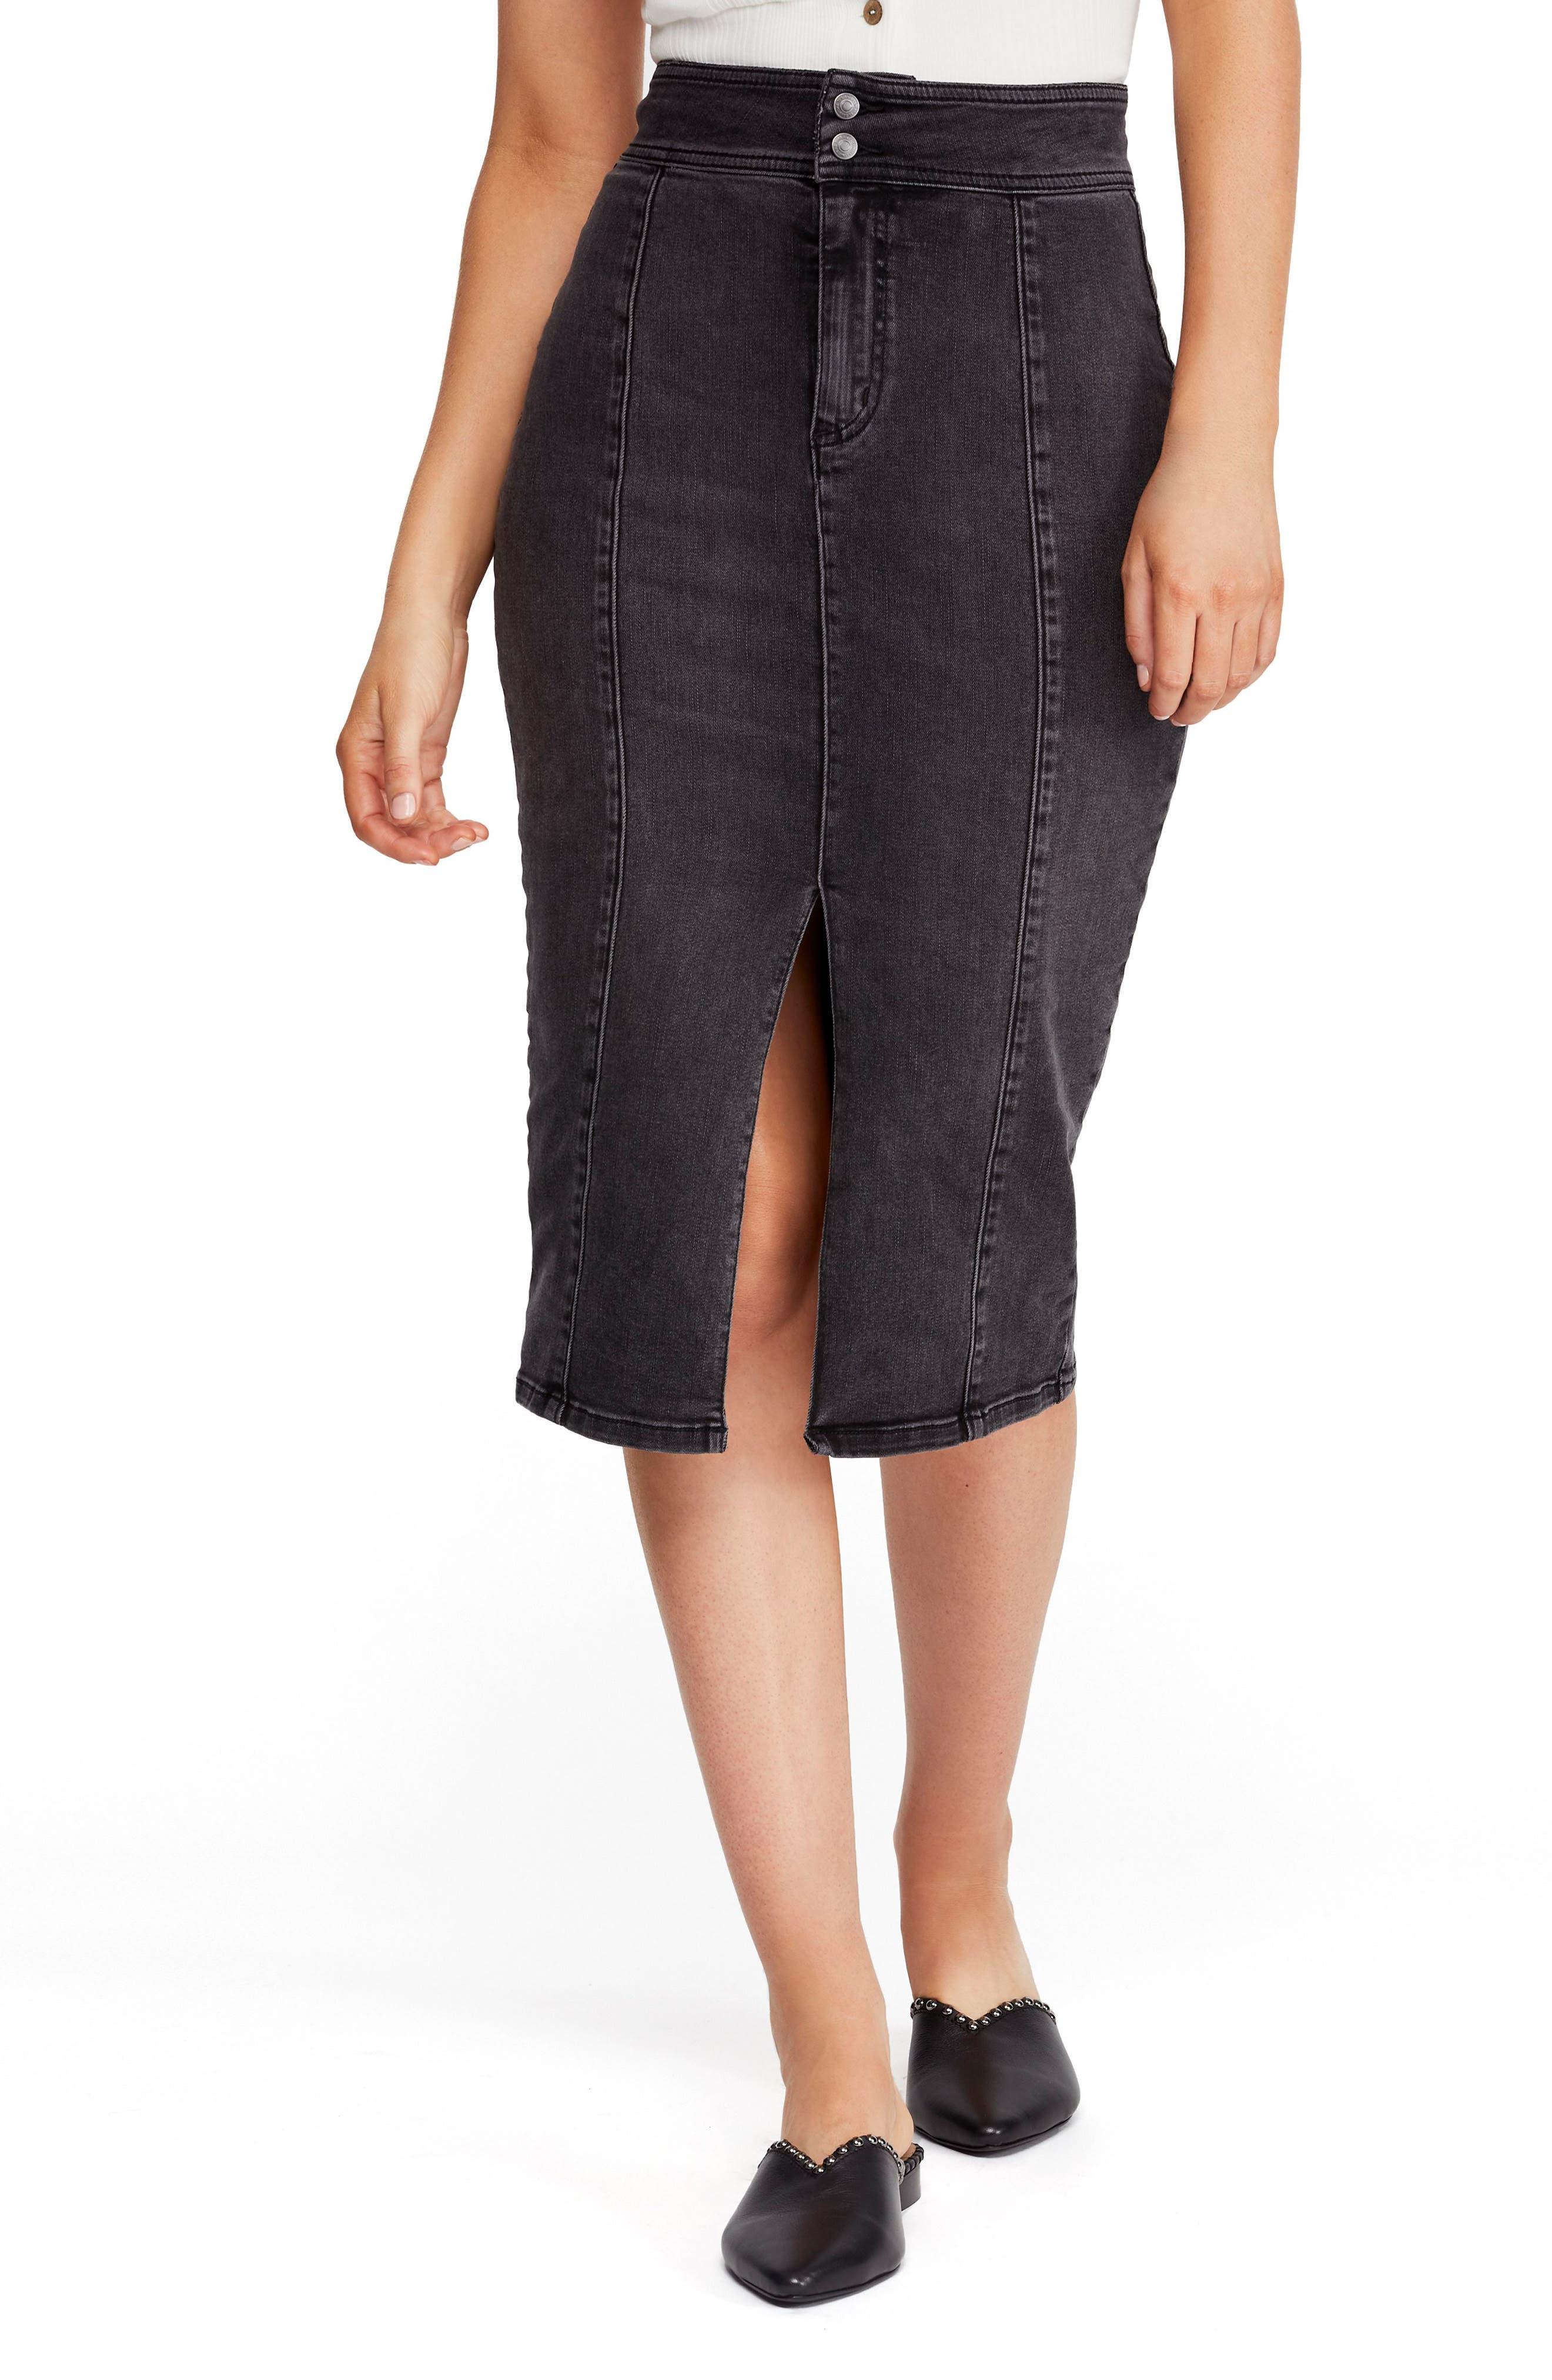 Free People Maddie Denim Midi Skirt, Black